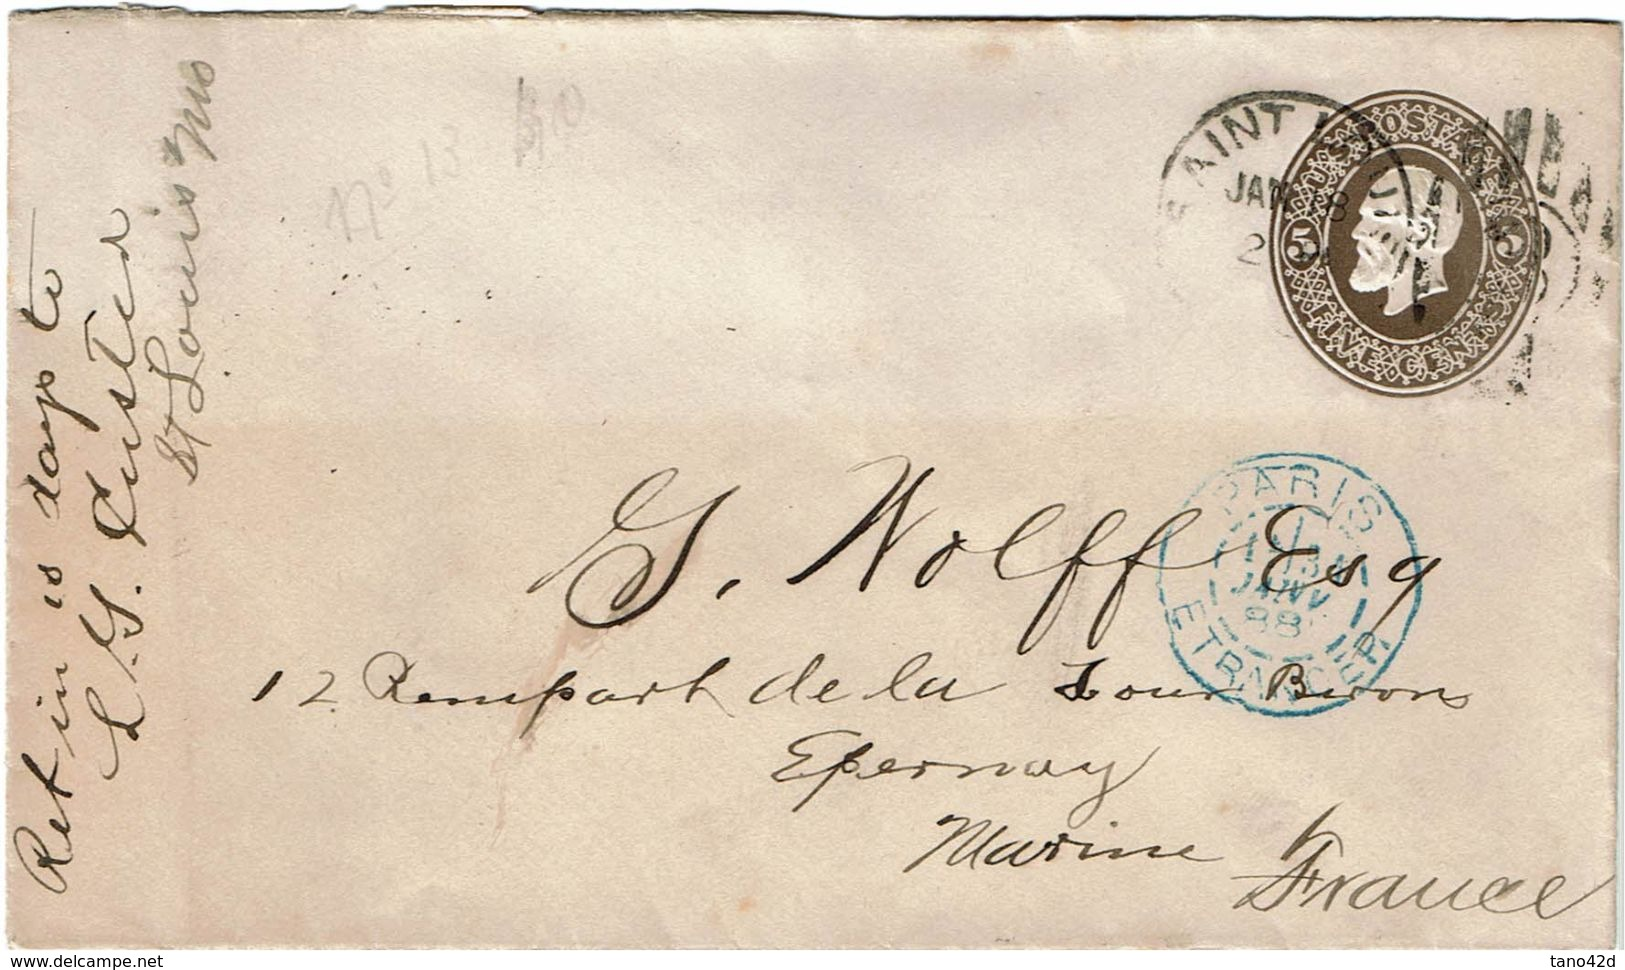 CTN49-11 - ETATS UNIS EP ENVELOPPE CIRCULEE JANVIER 1888 - Postal Stationery